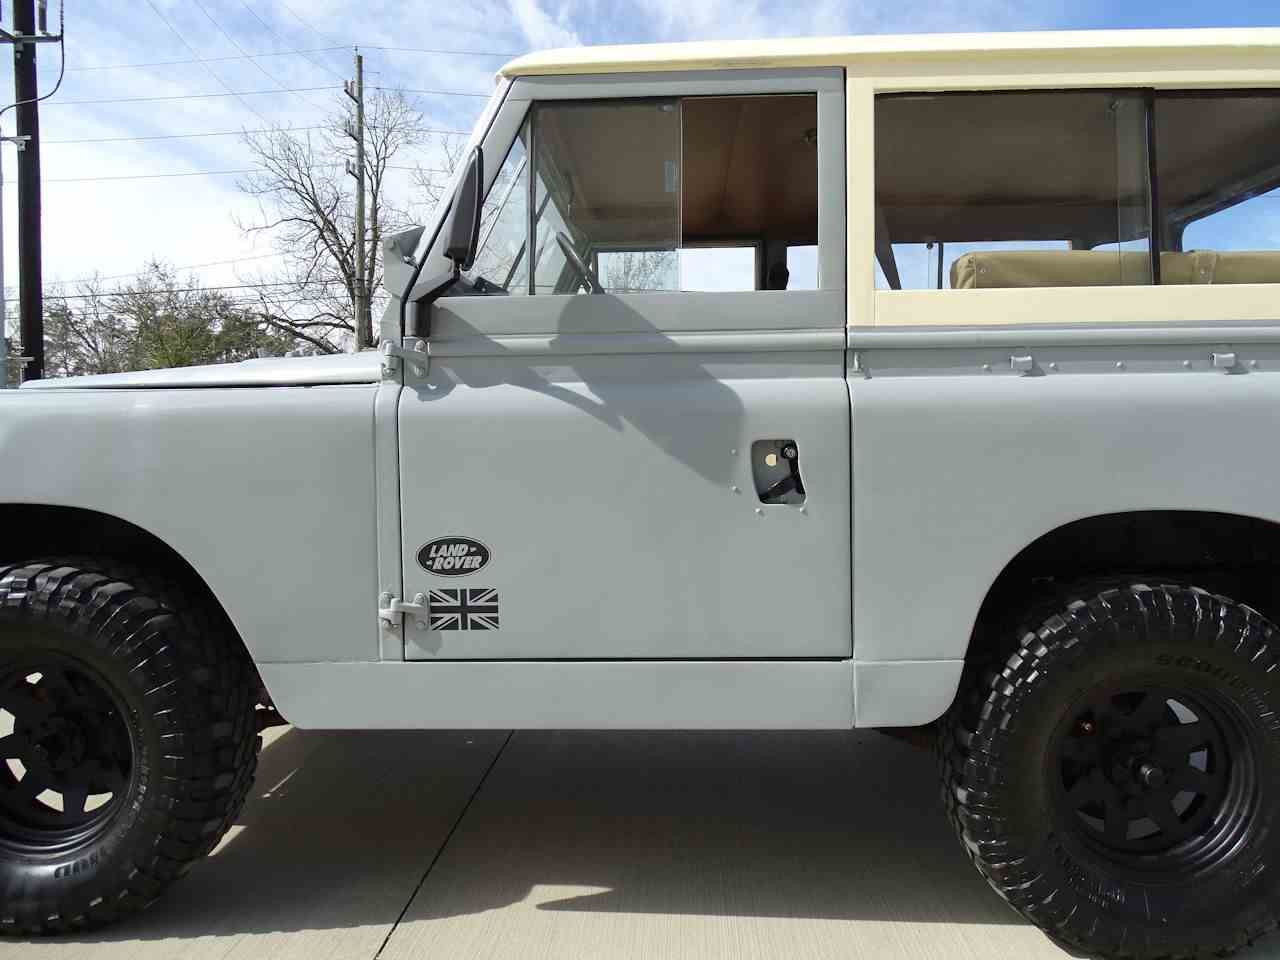 Classic Cars For Sale Houston Area: 1969 Land Rover Santana For Sale